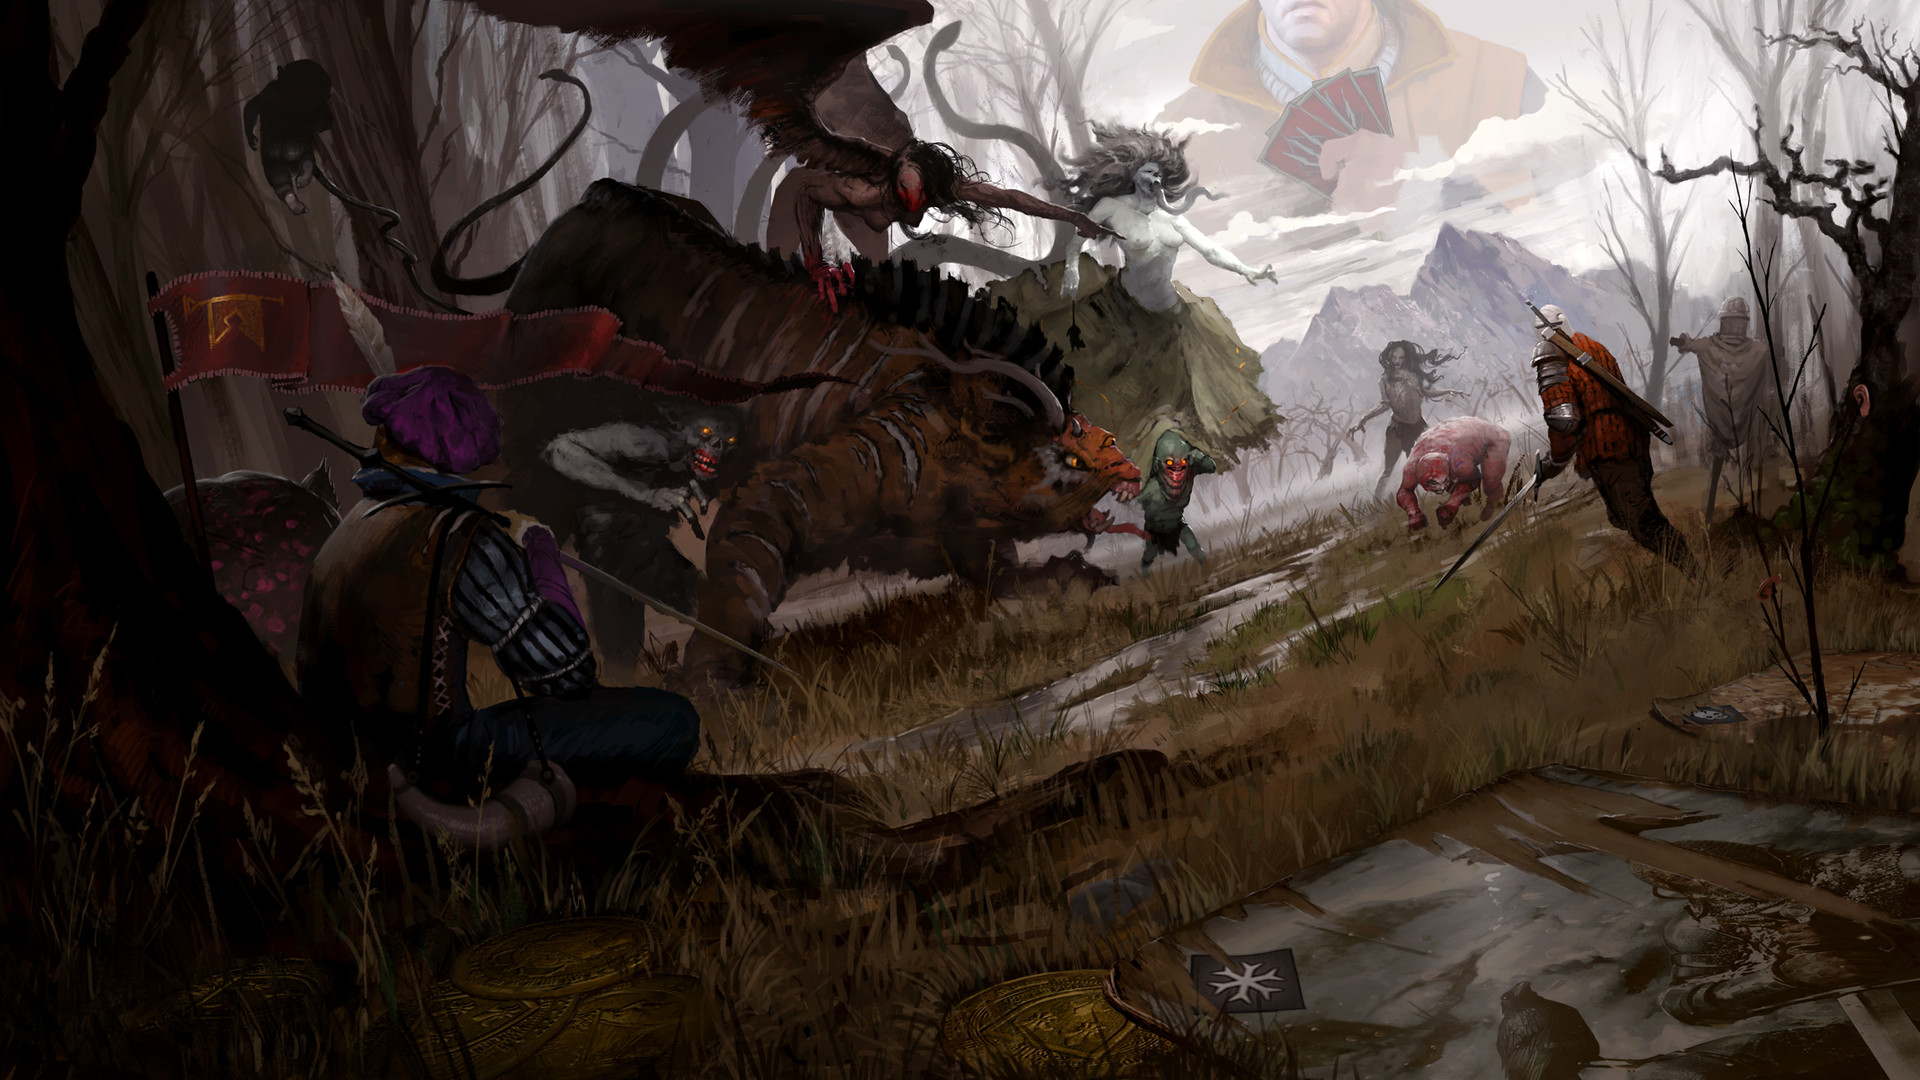 ArtStation Gwent Battle Maxim Kozlov